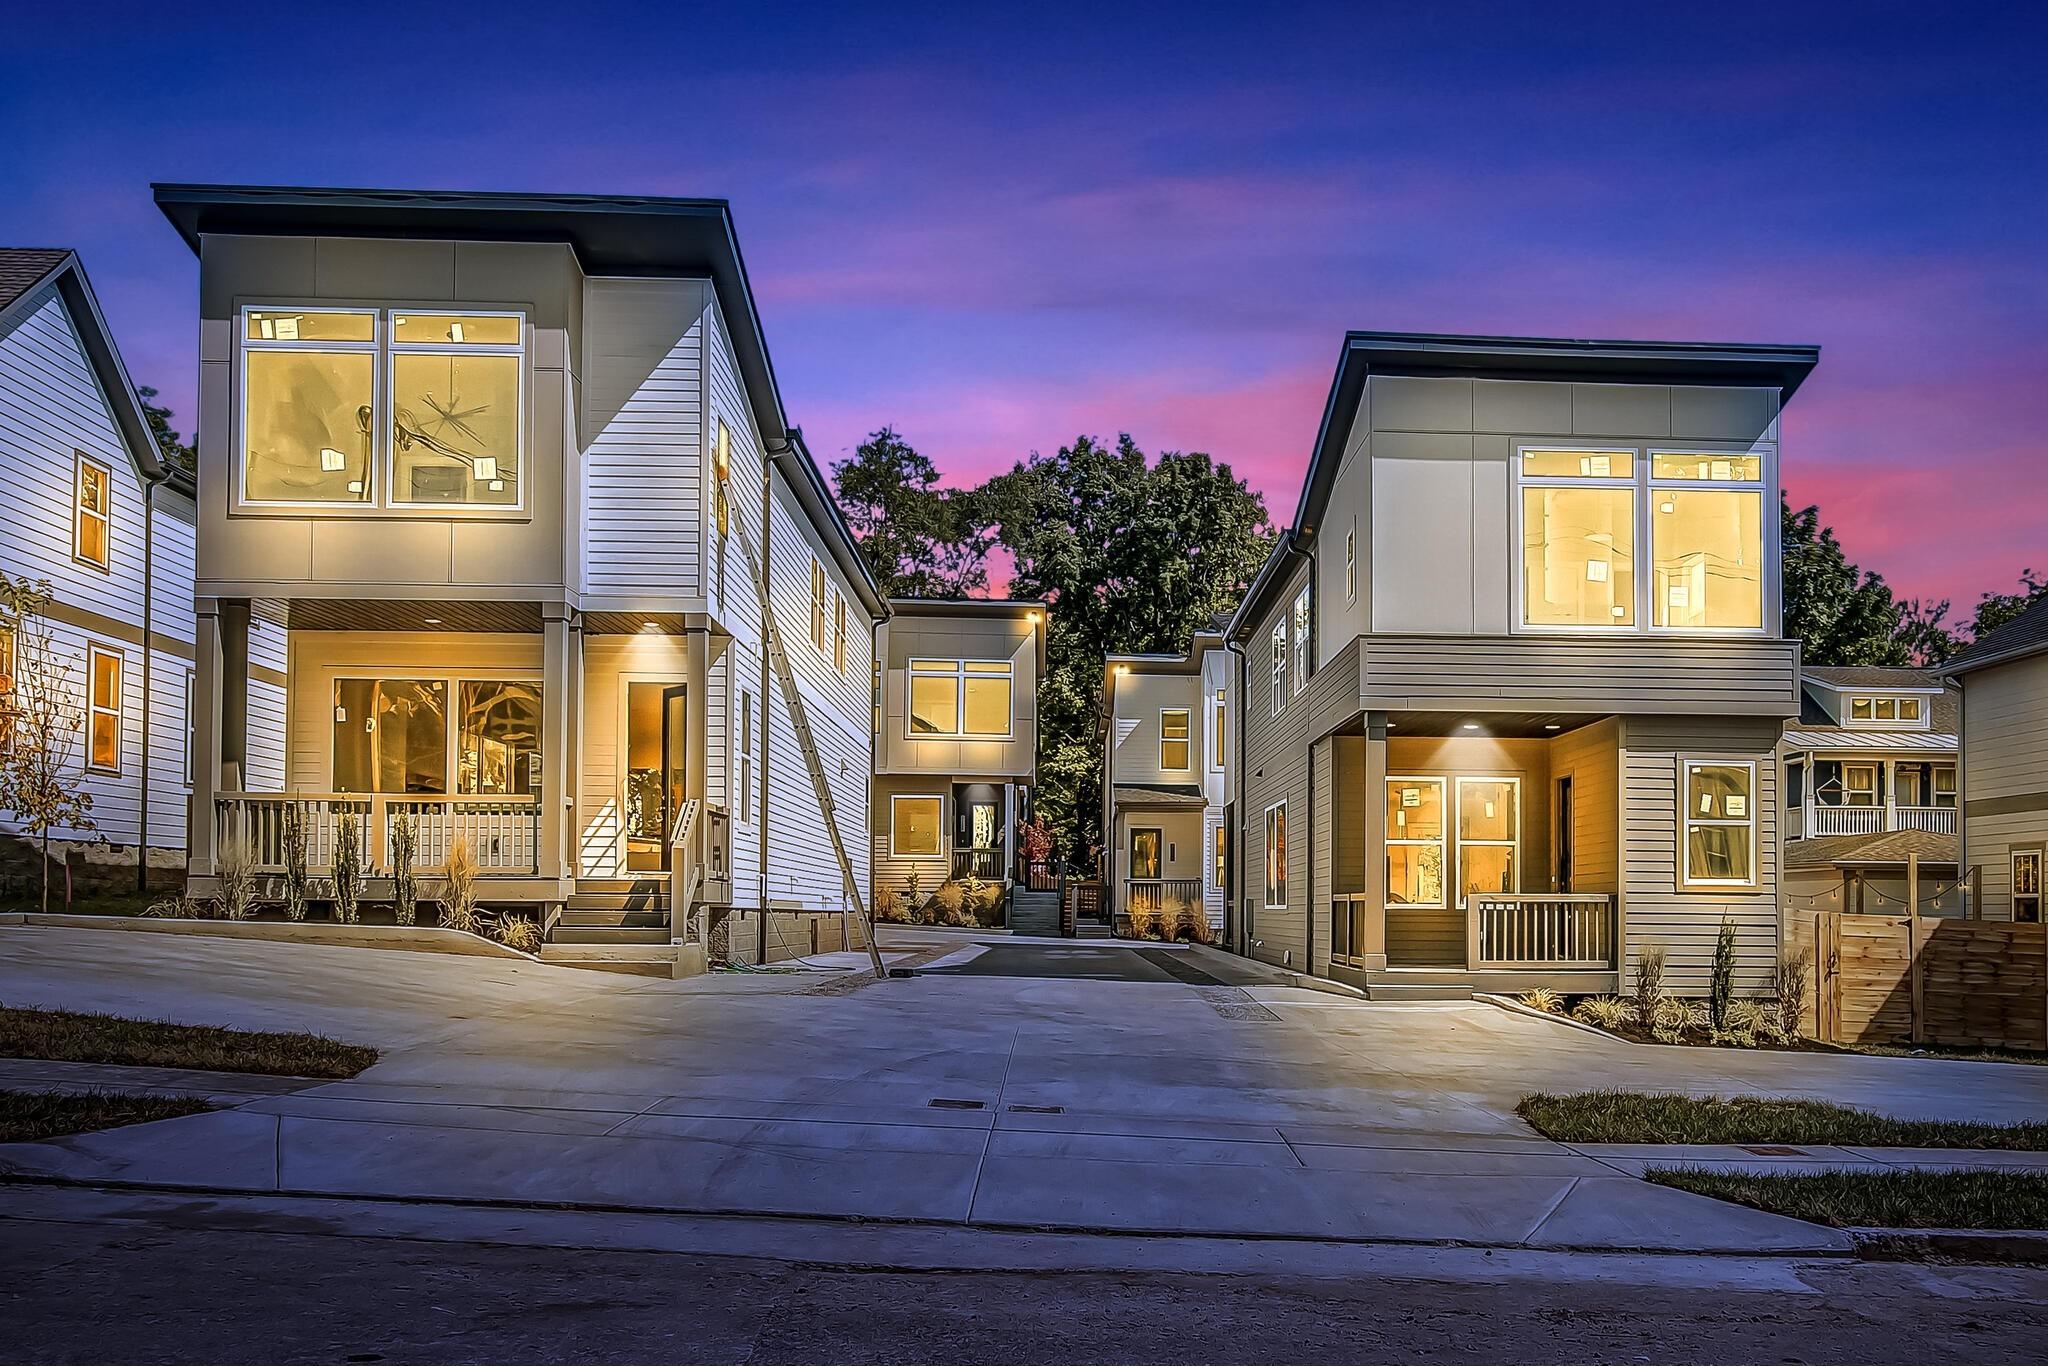 917B Delmas Ave Property Photo - Nashville, TN real estate listing